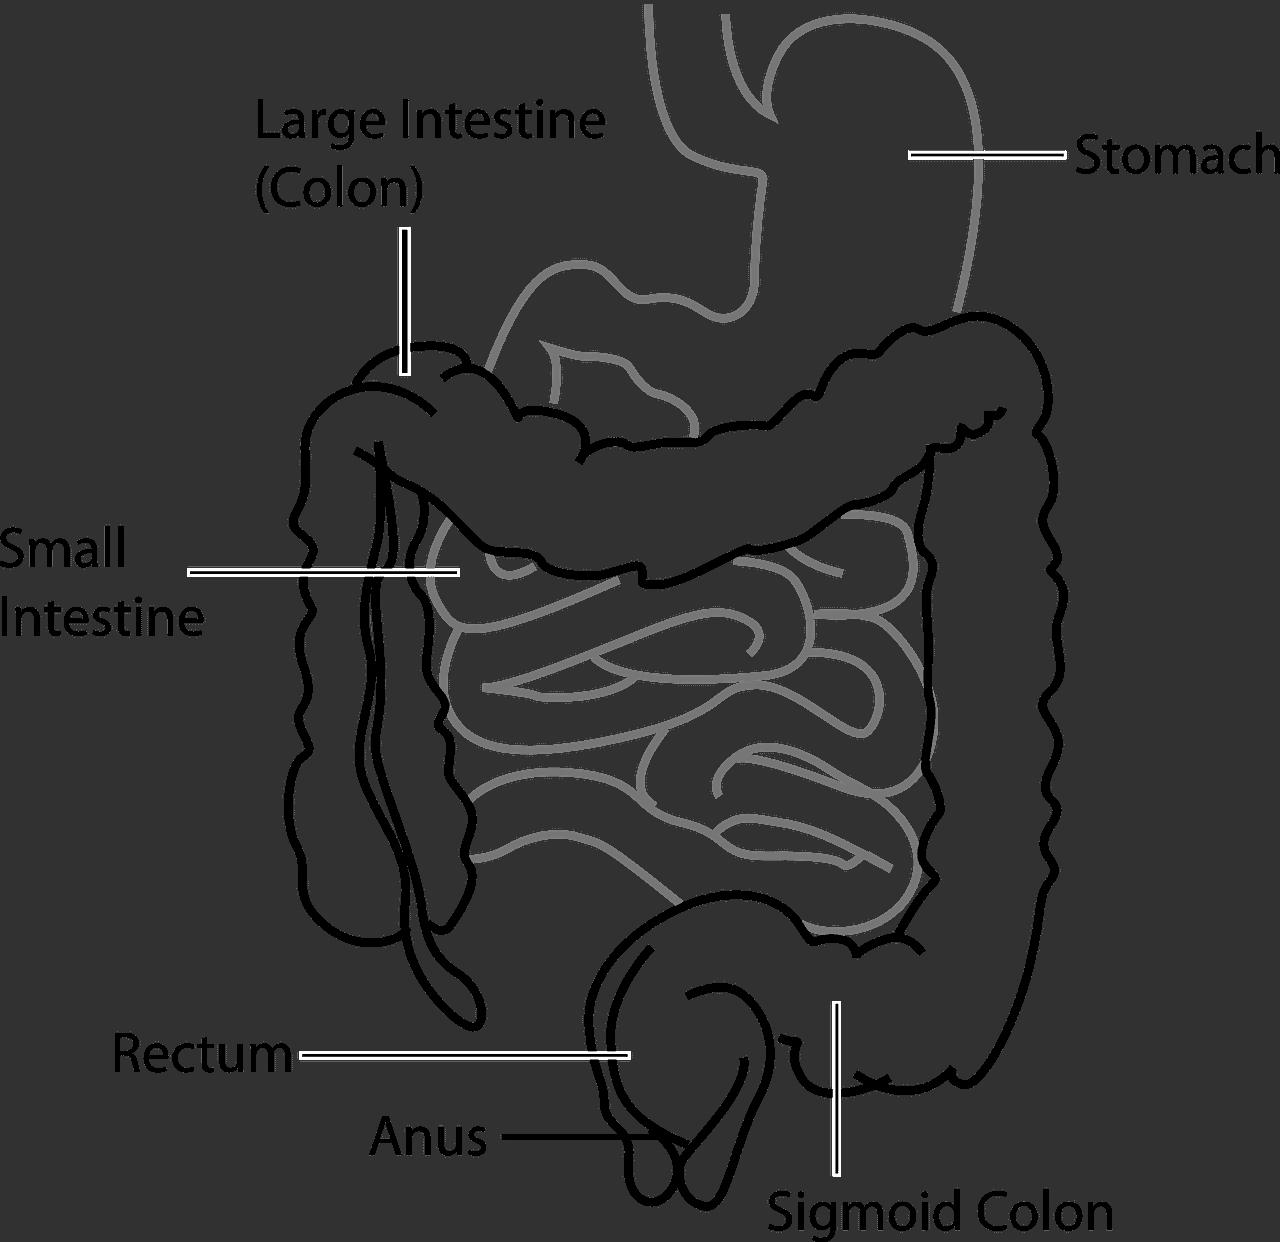 digestive track